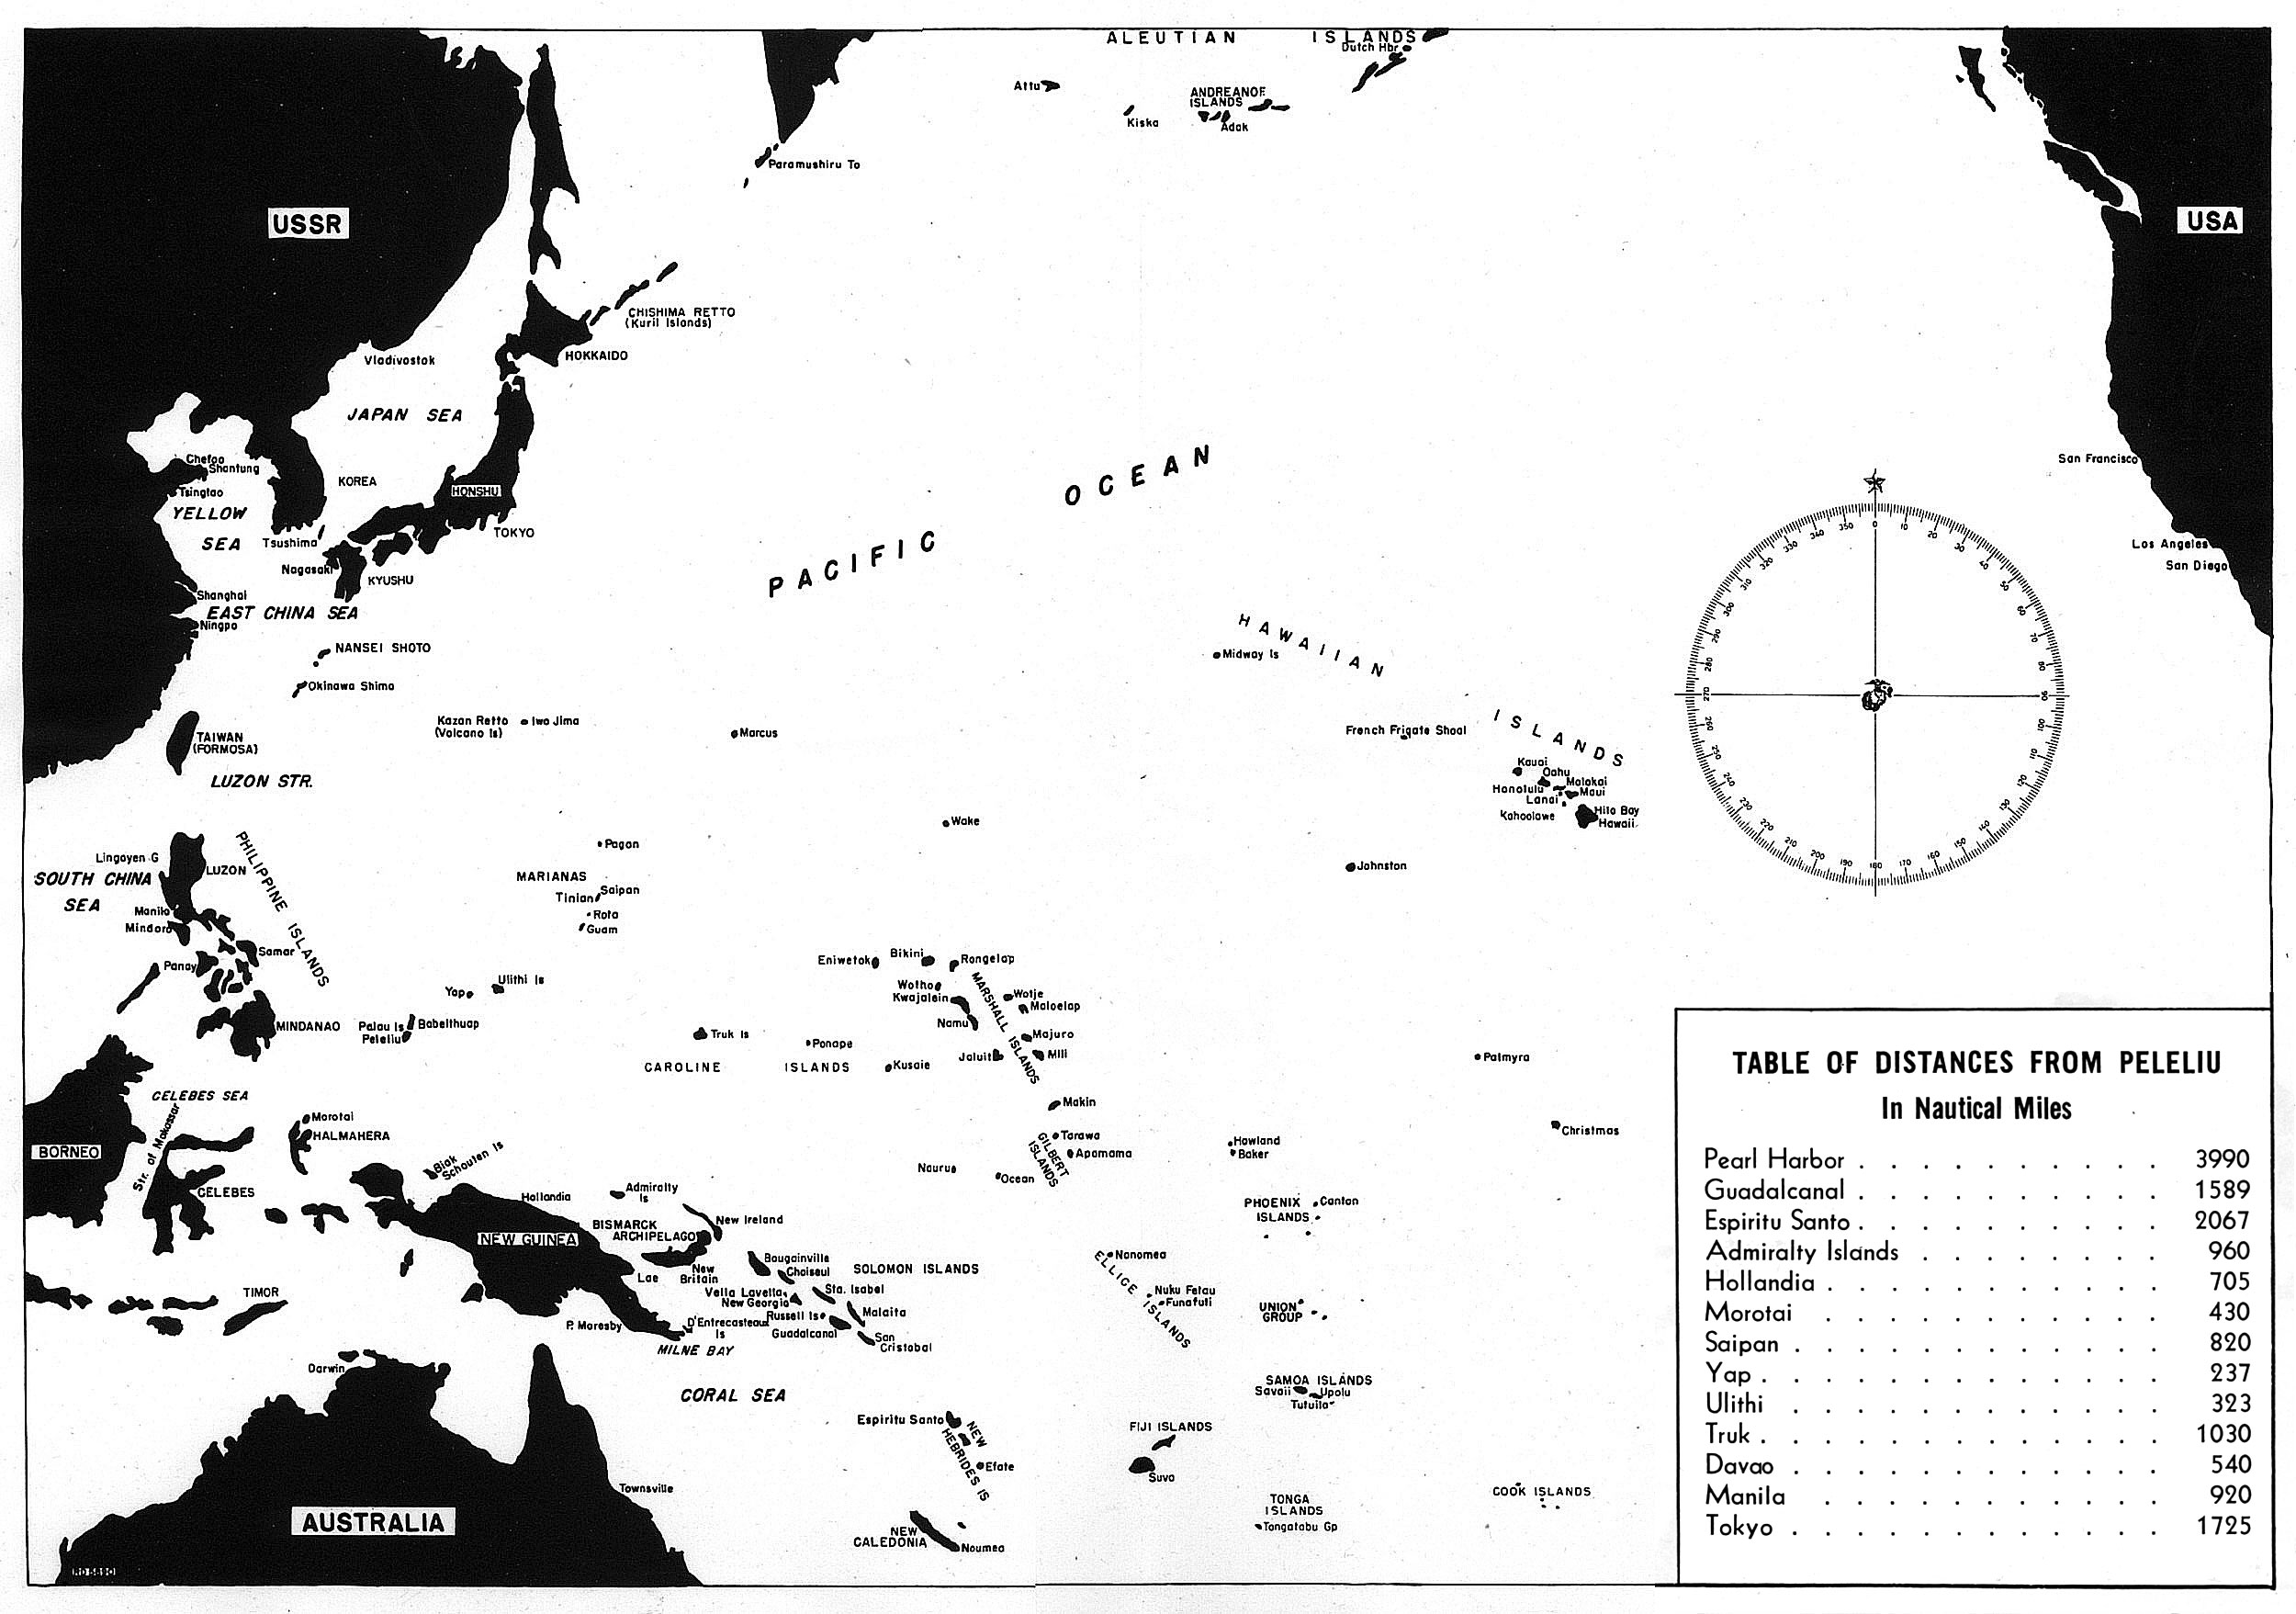 Hyperwar Usmc Monograph The Assault On Peleliu